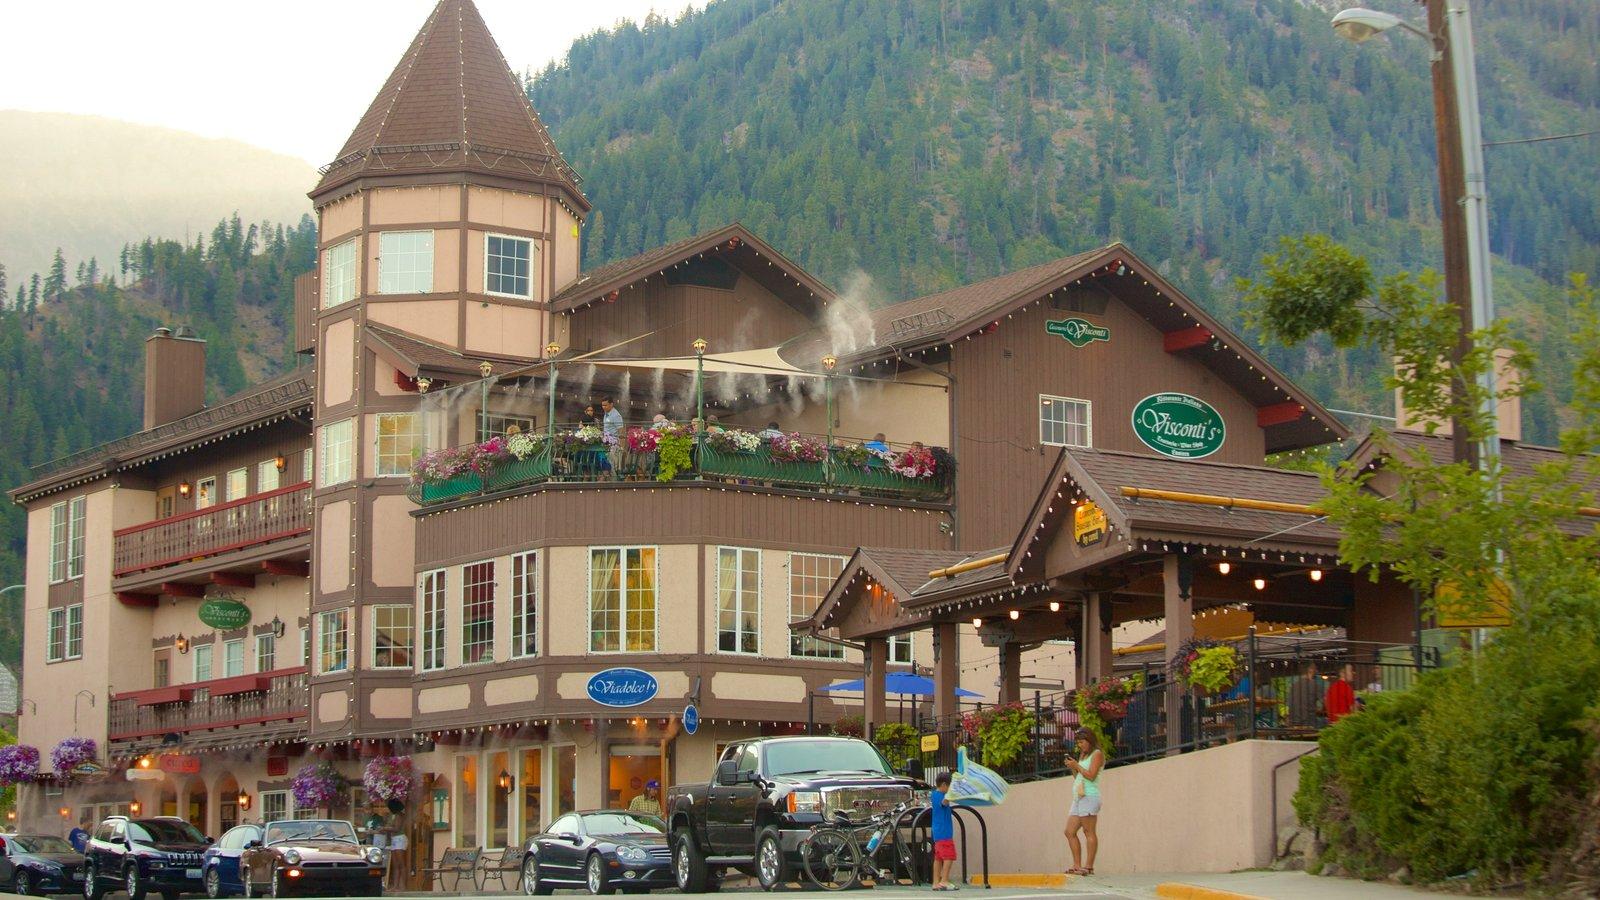 Leavenworth caracterizando cenas de rua